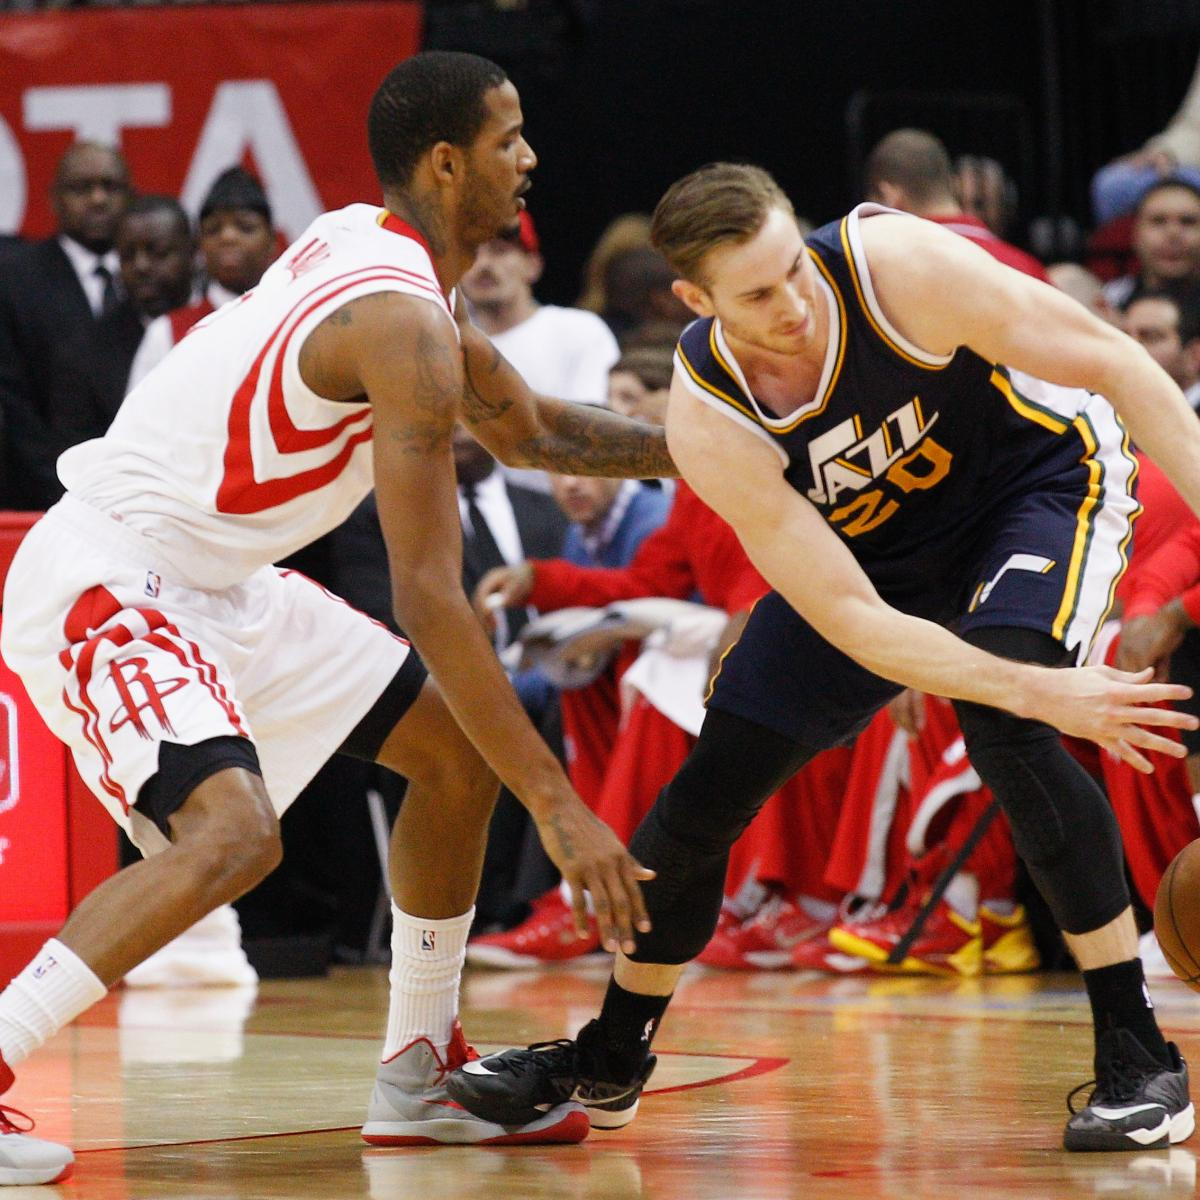 Rockets Jazz Game 2: Utah Jazz Vs. Houston Rockets 1/10/15: Video Highlights